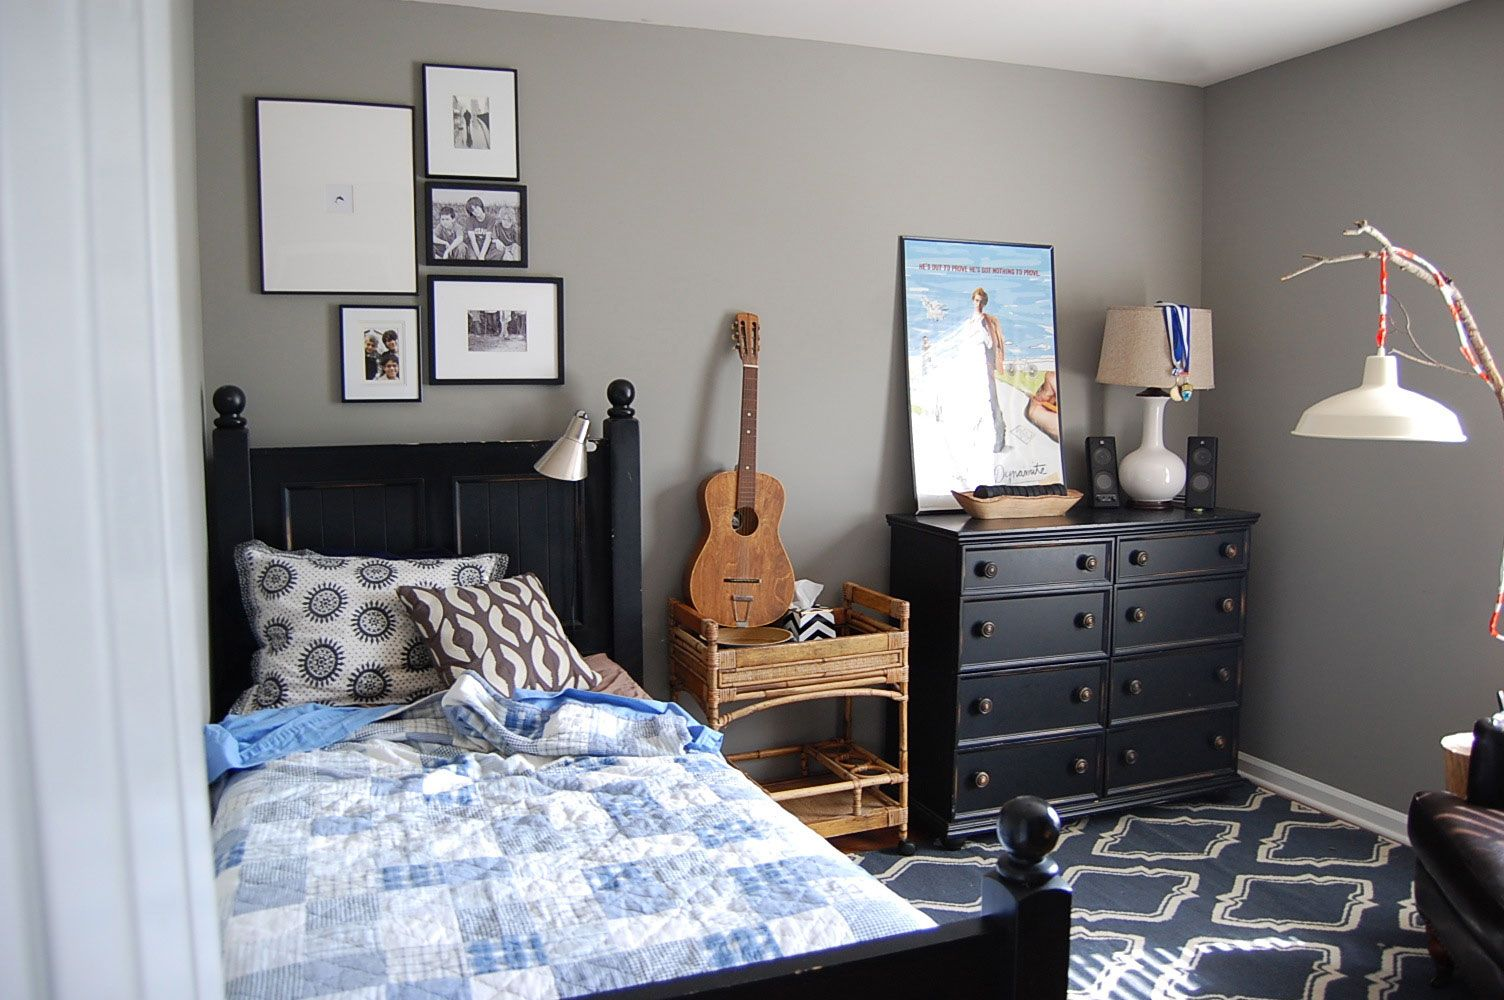 Boy Bedroom Ideas With Black Furniture Bedroomideas Boy Room Paint Teenager Bedroom Boy Traditional Bedroom Furniture